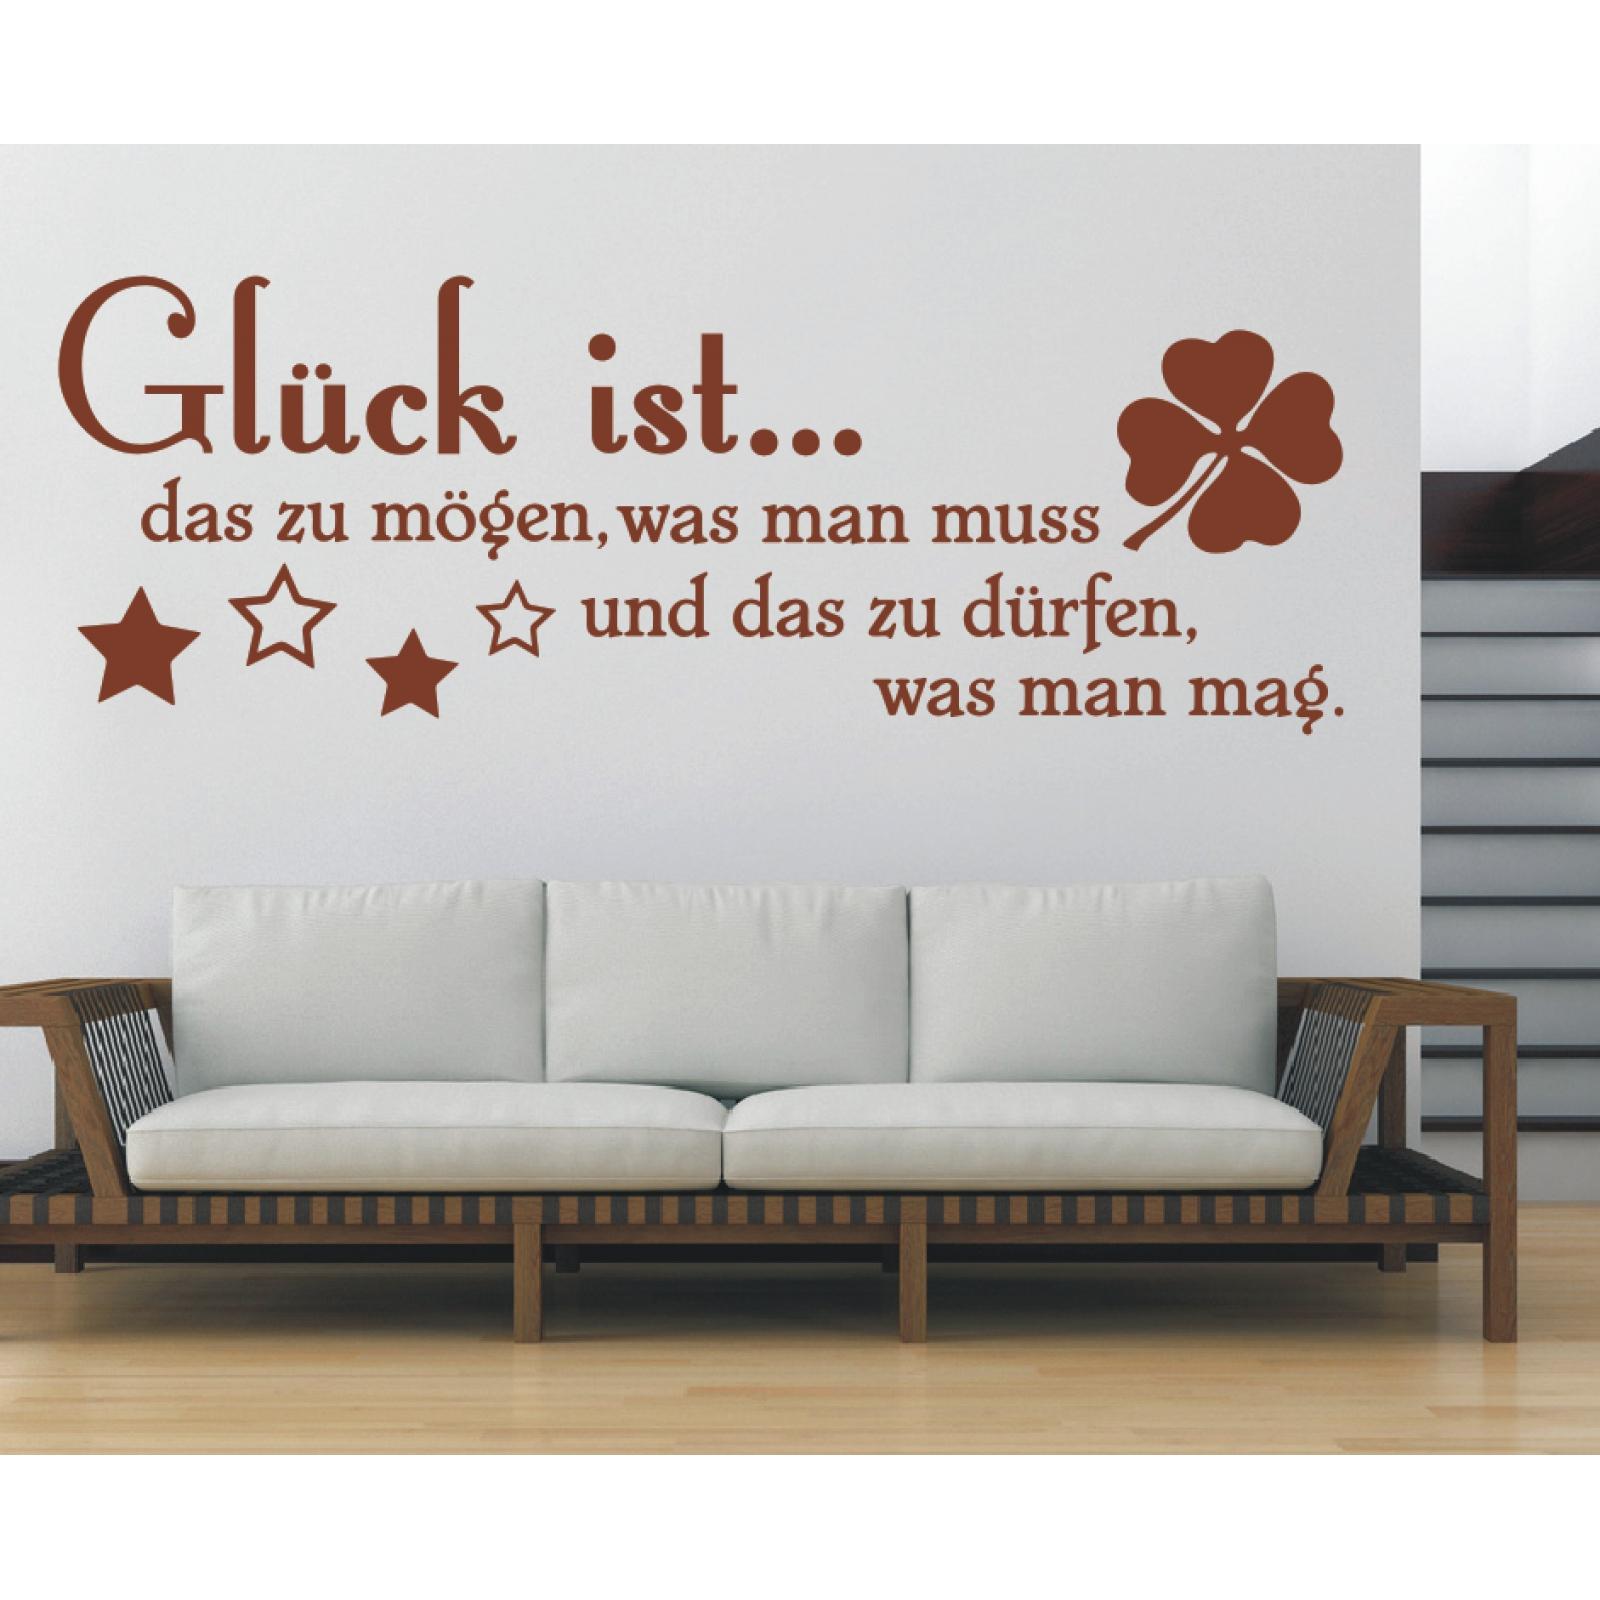 Spruch-WANDTATTOO-Glueck-ist-moegen-was-muss-Wandsticker-Wandaufkleber-Sticker-3